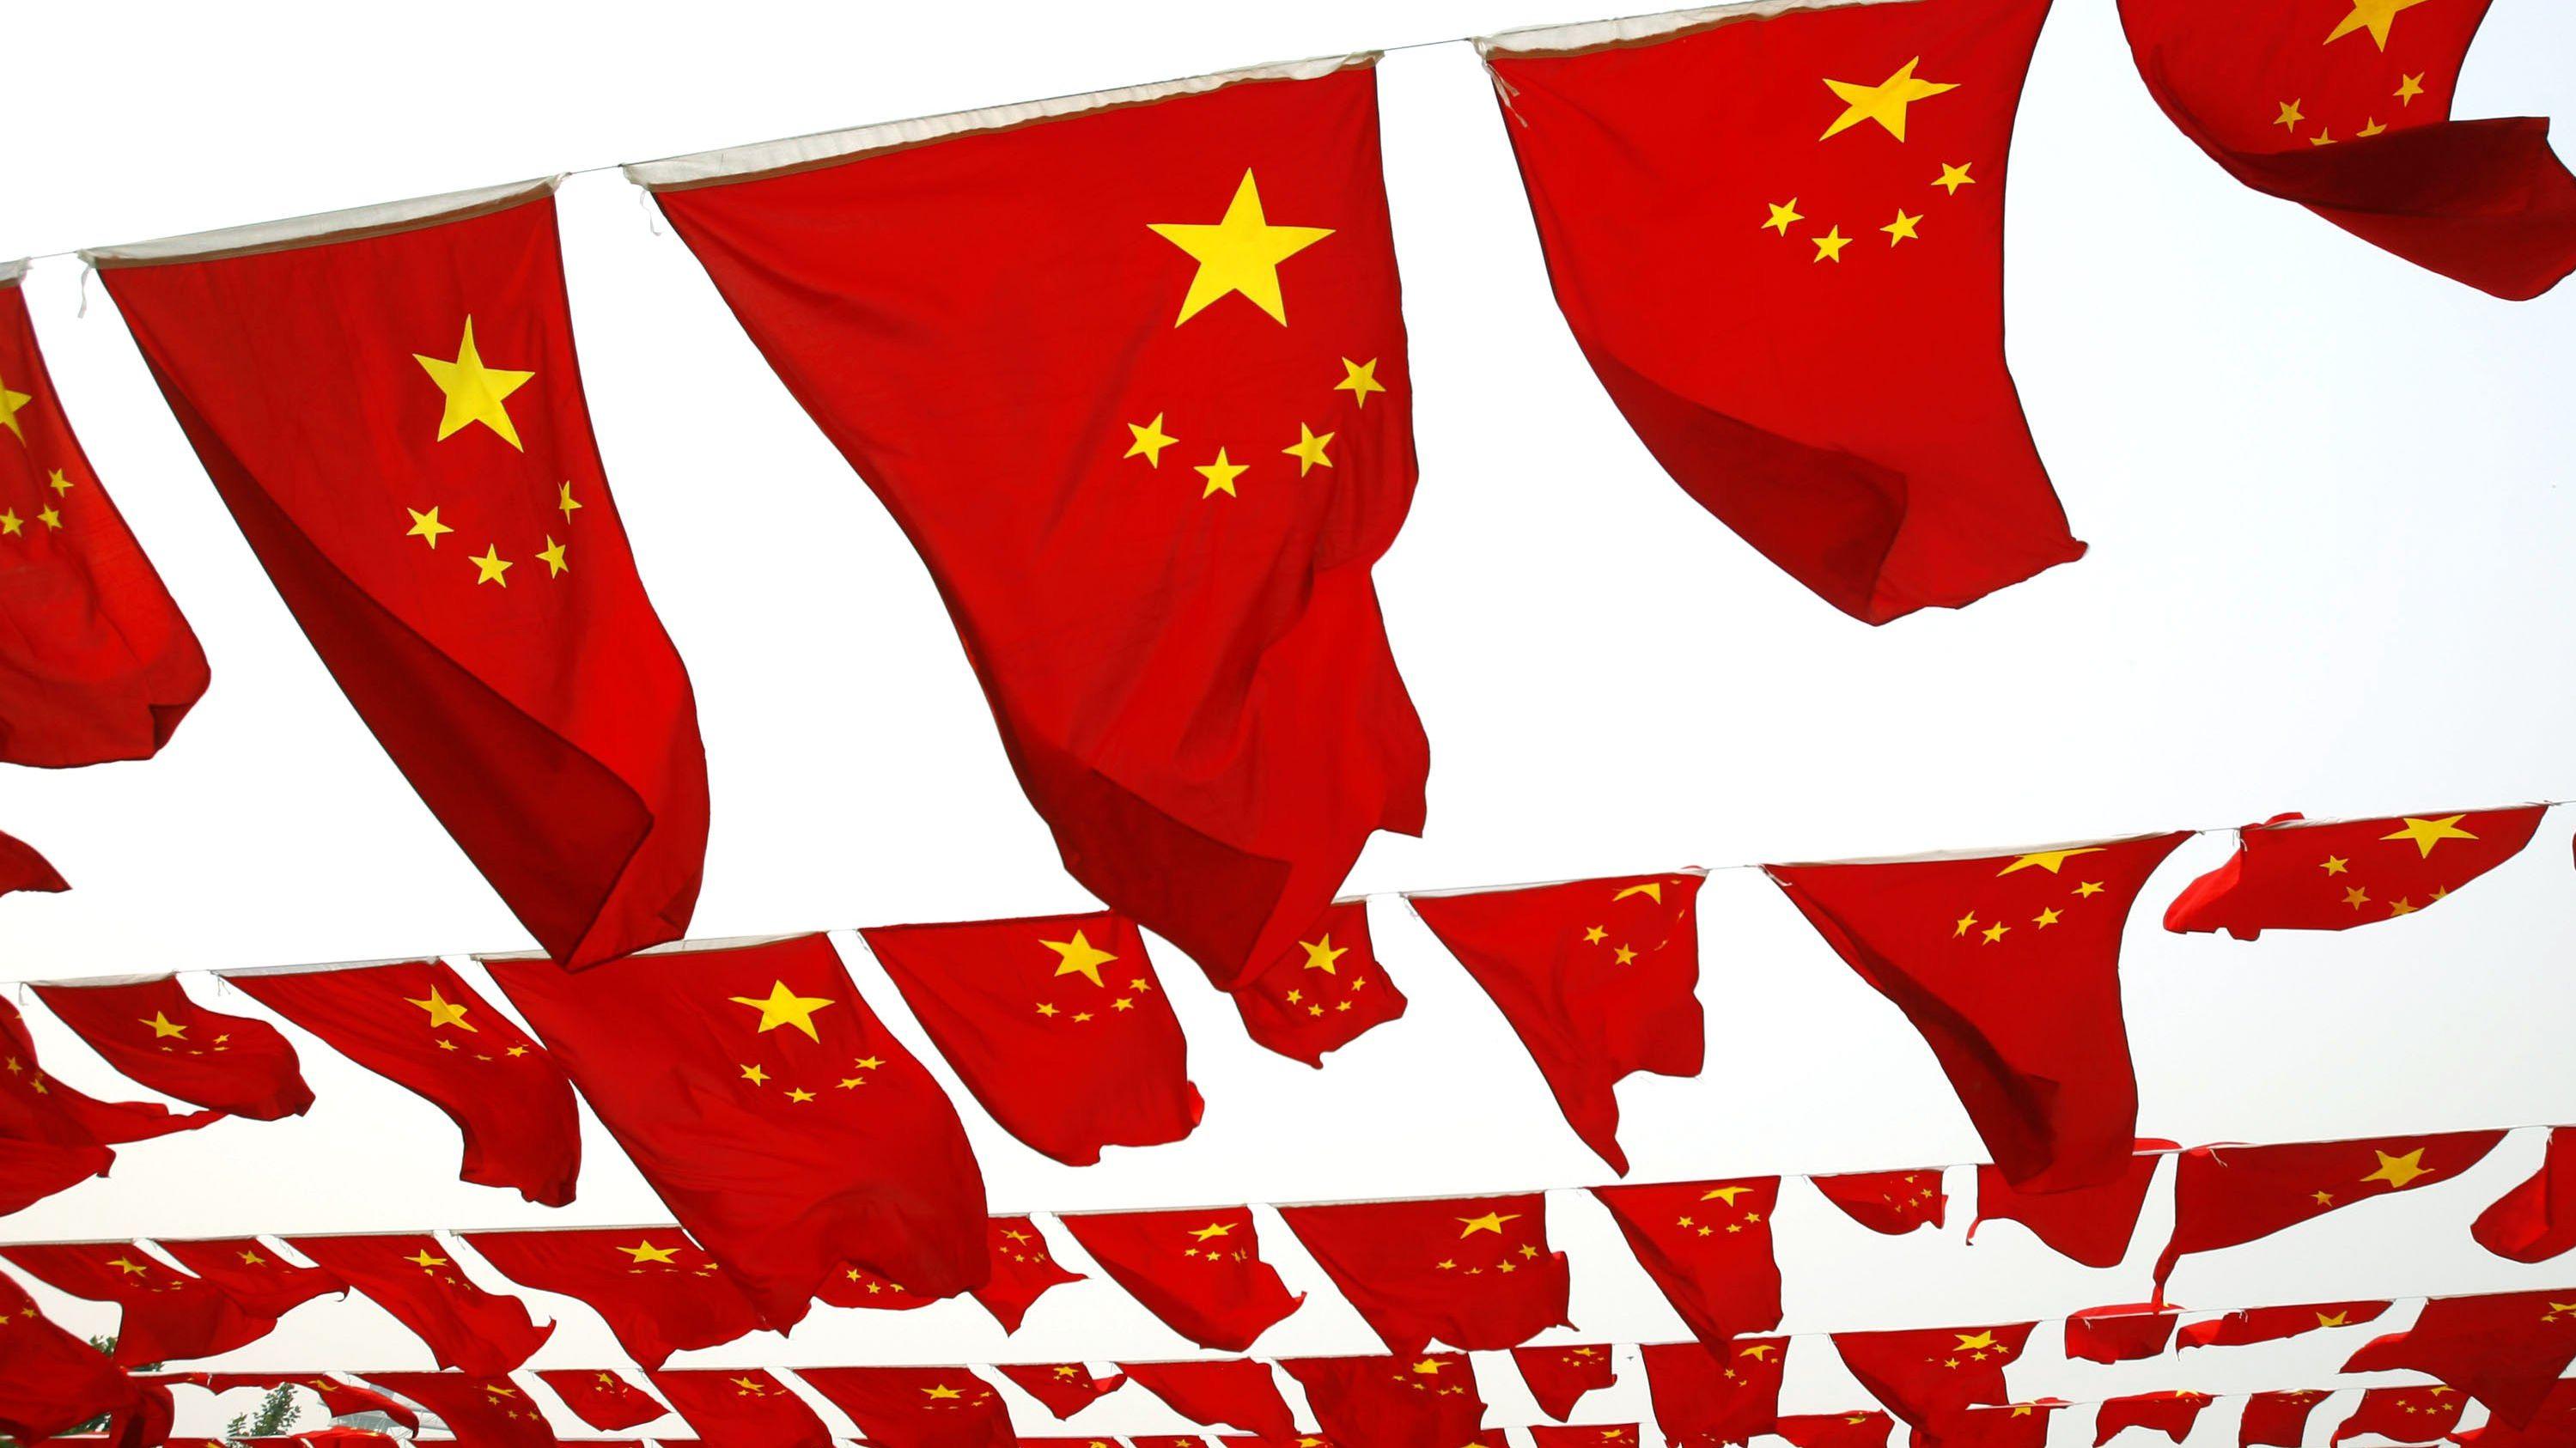 AIの標準化で主導権狙う中国、「インターネットの二の舞」警戒